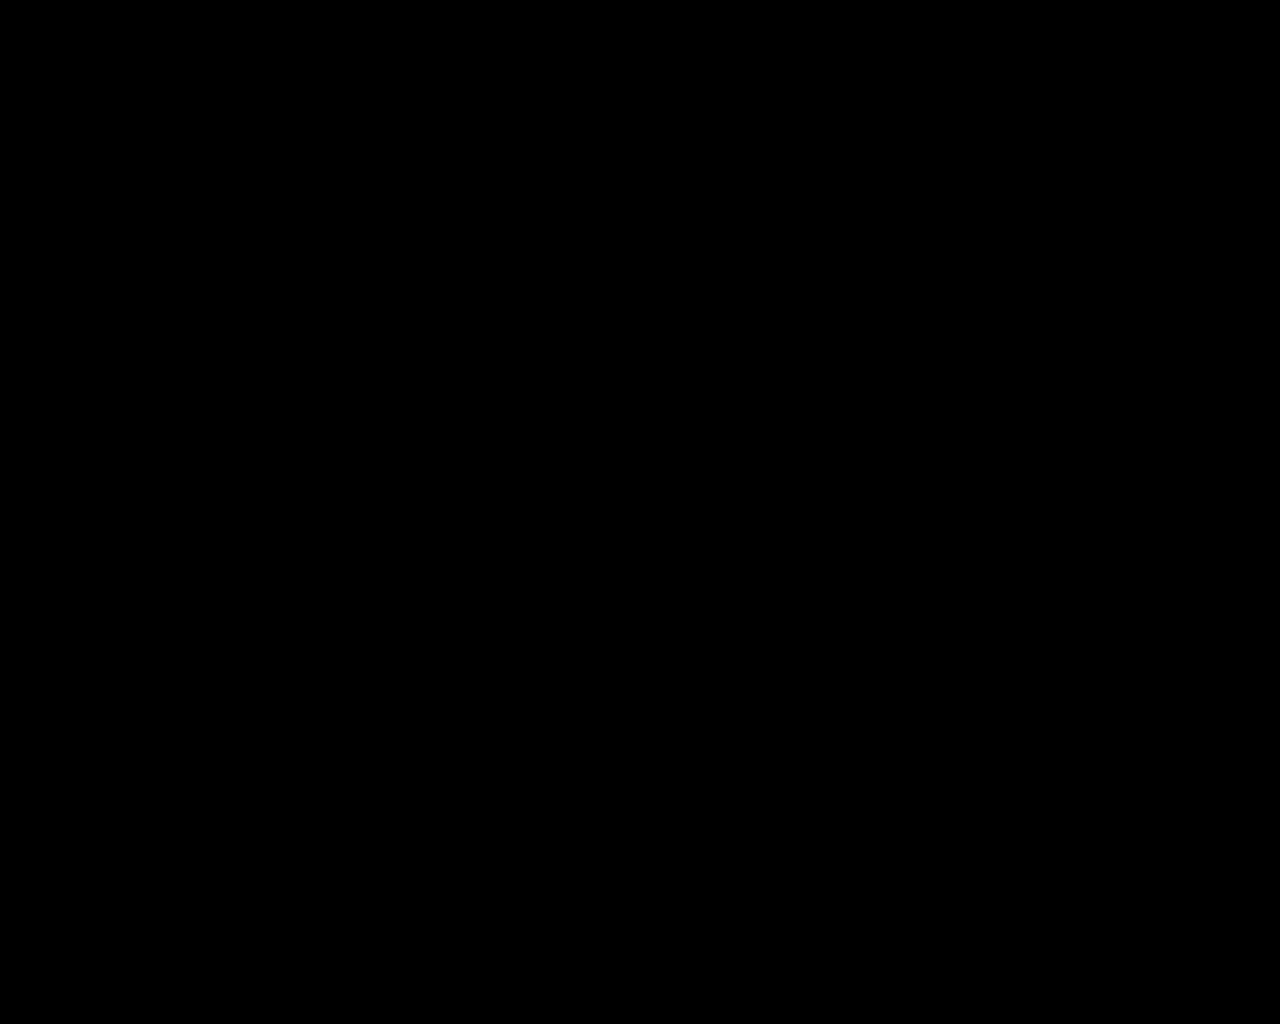 image GIFs